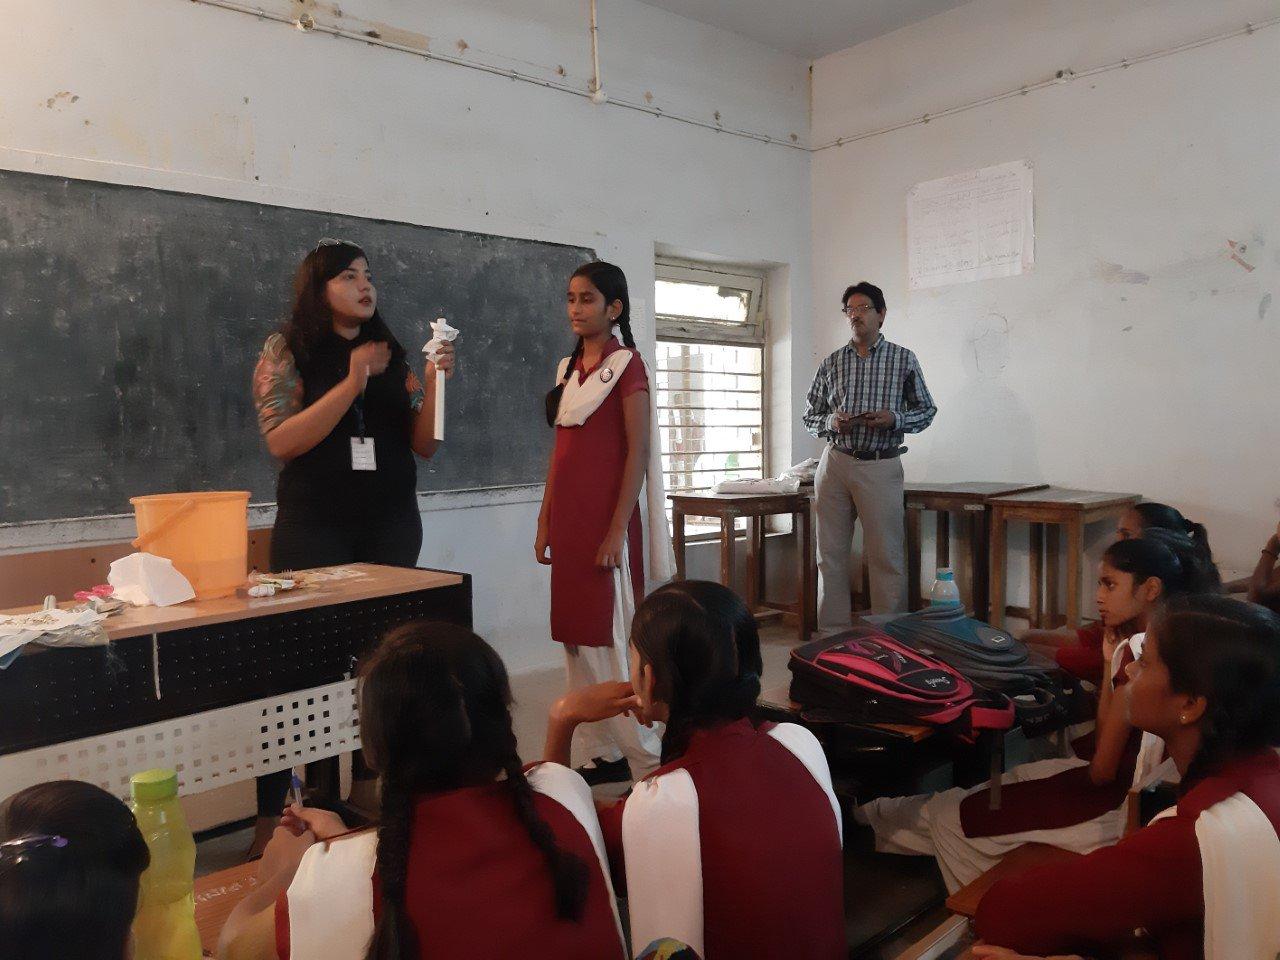 Amity University Gwalior On Twitter Amityforsociety Under The Vidyadaan Initiative Ms Twinkle Rastogi Faculty Of Amity School Of Fashion Design Technology Conducted A Workshop In Govt Padmaraja Shaskiya Mahavidhyalaya Explaining About